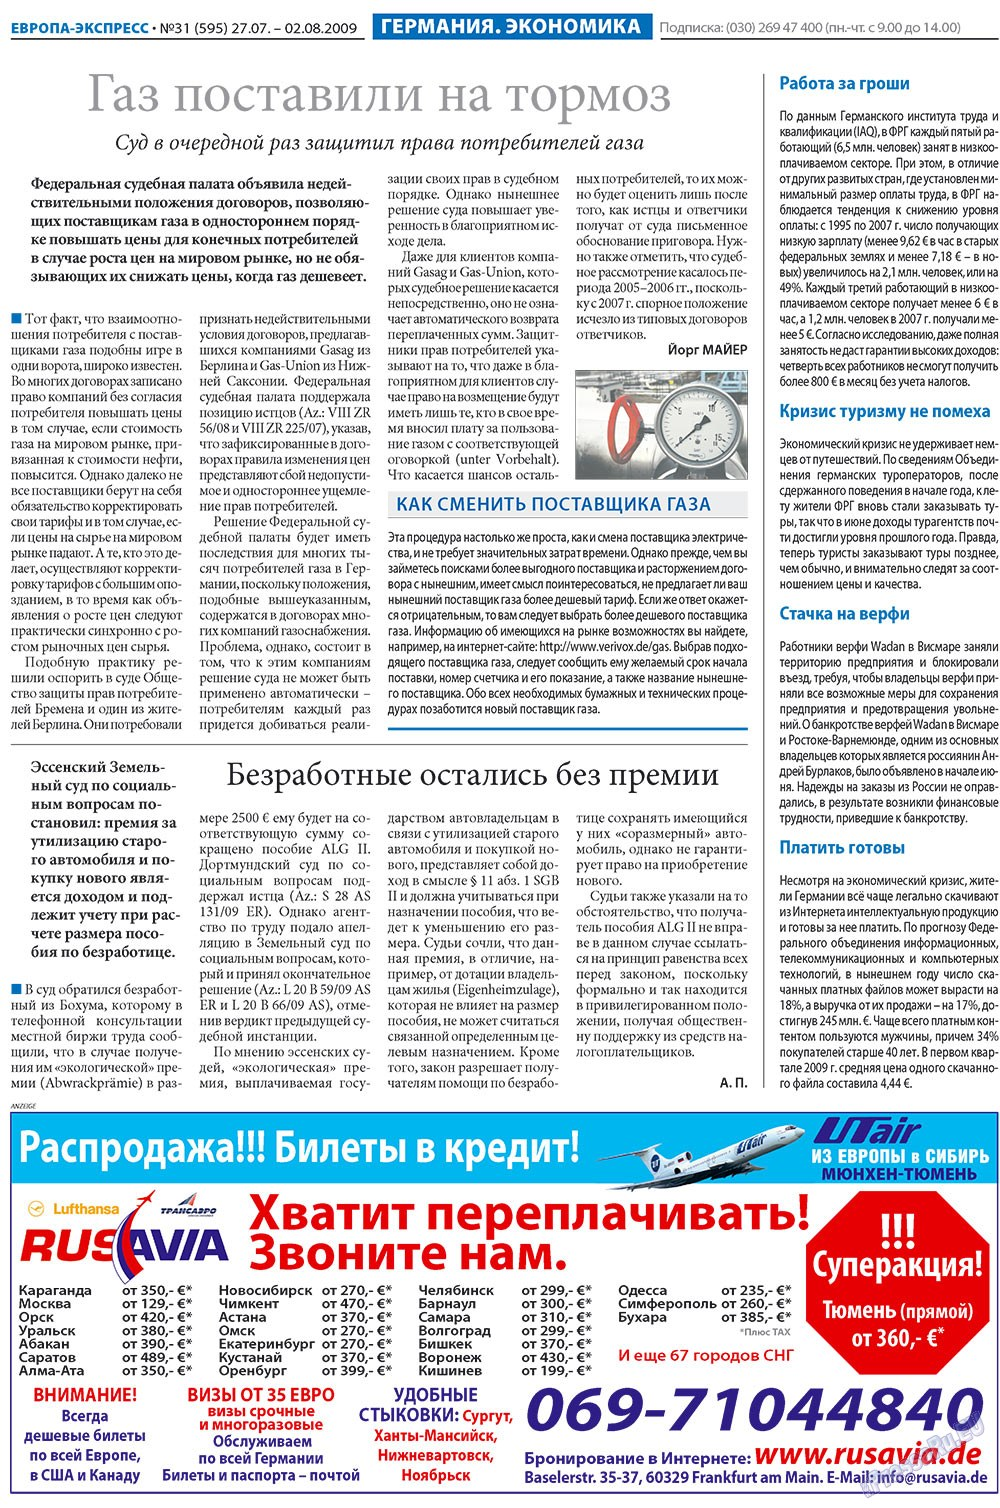 Европа экспресс (газета). 2009 год, номер 31, стр. 3